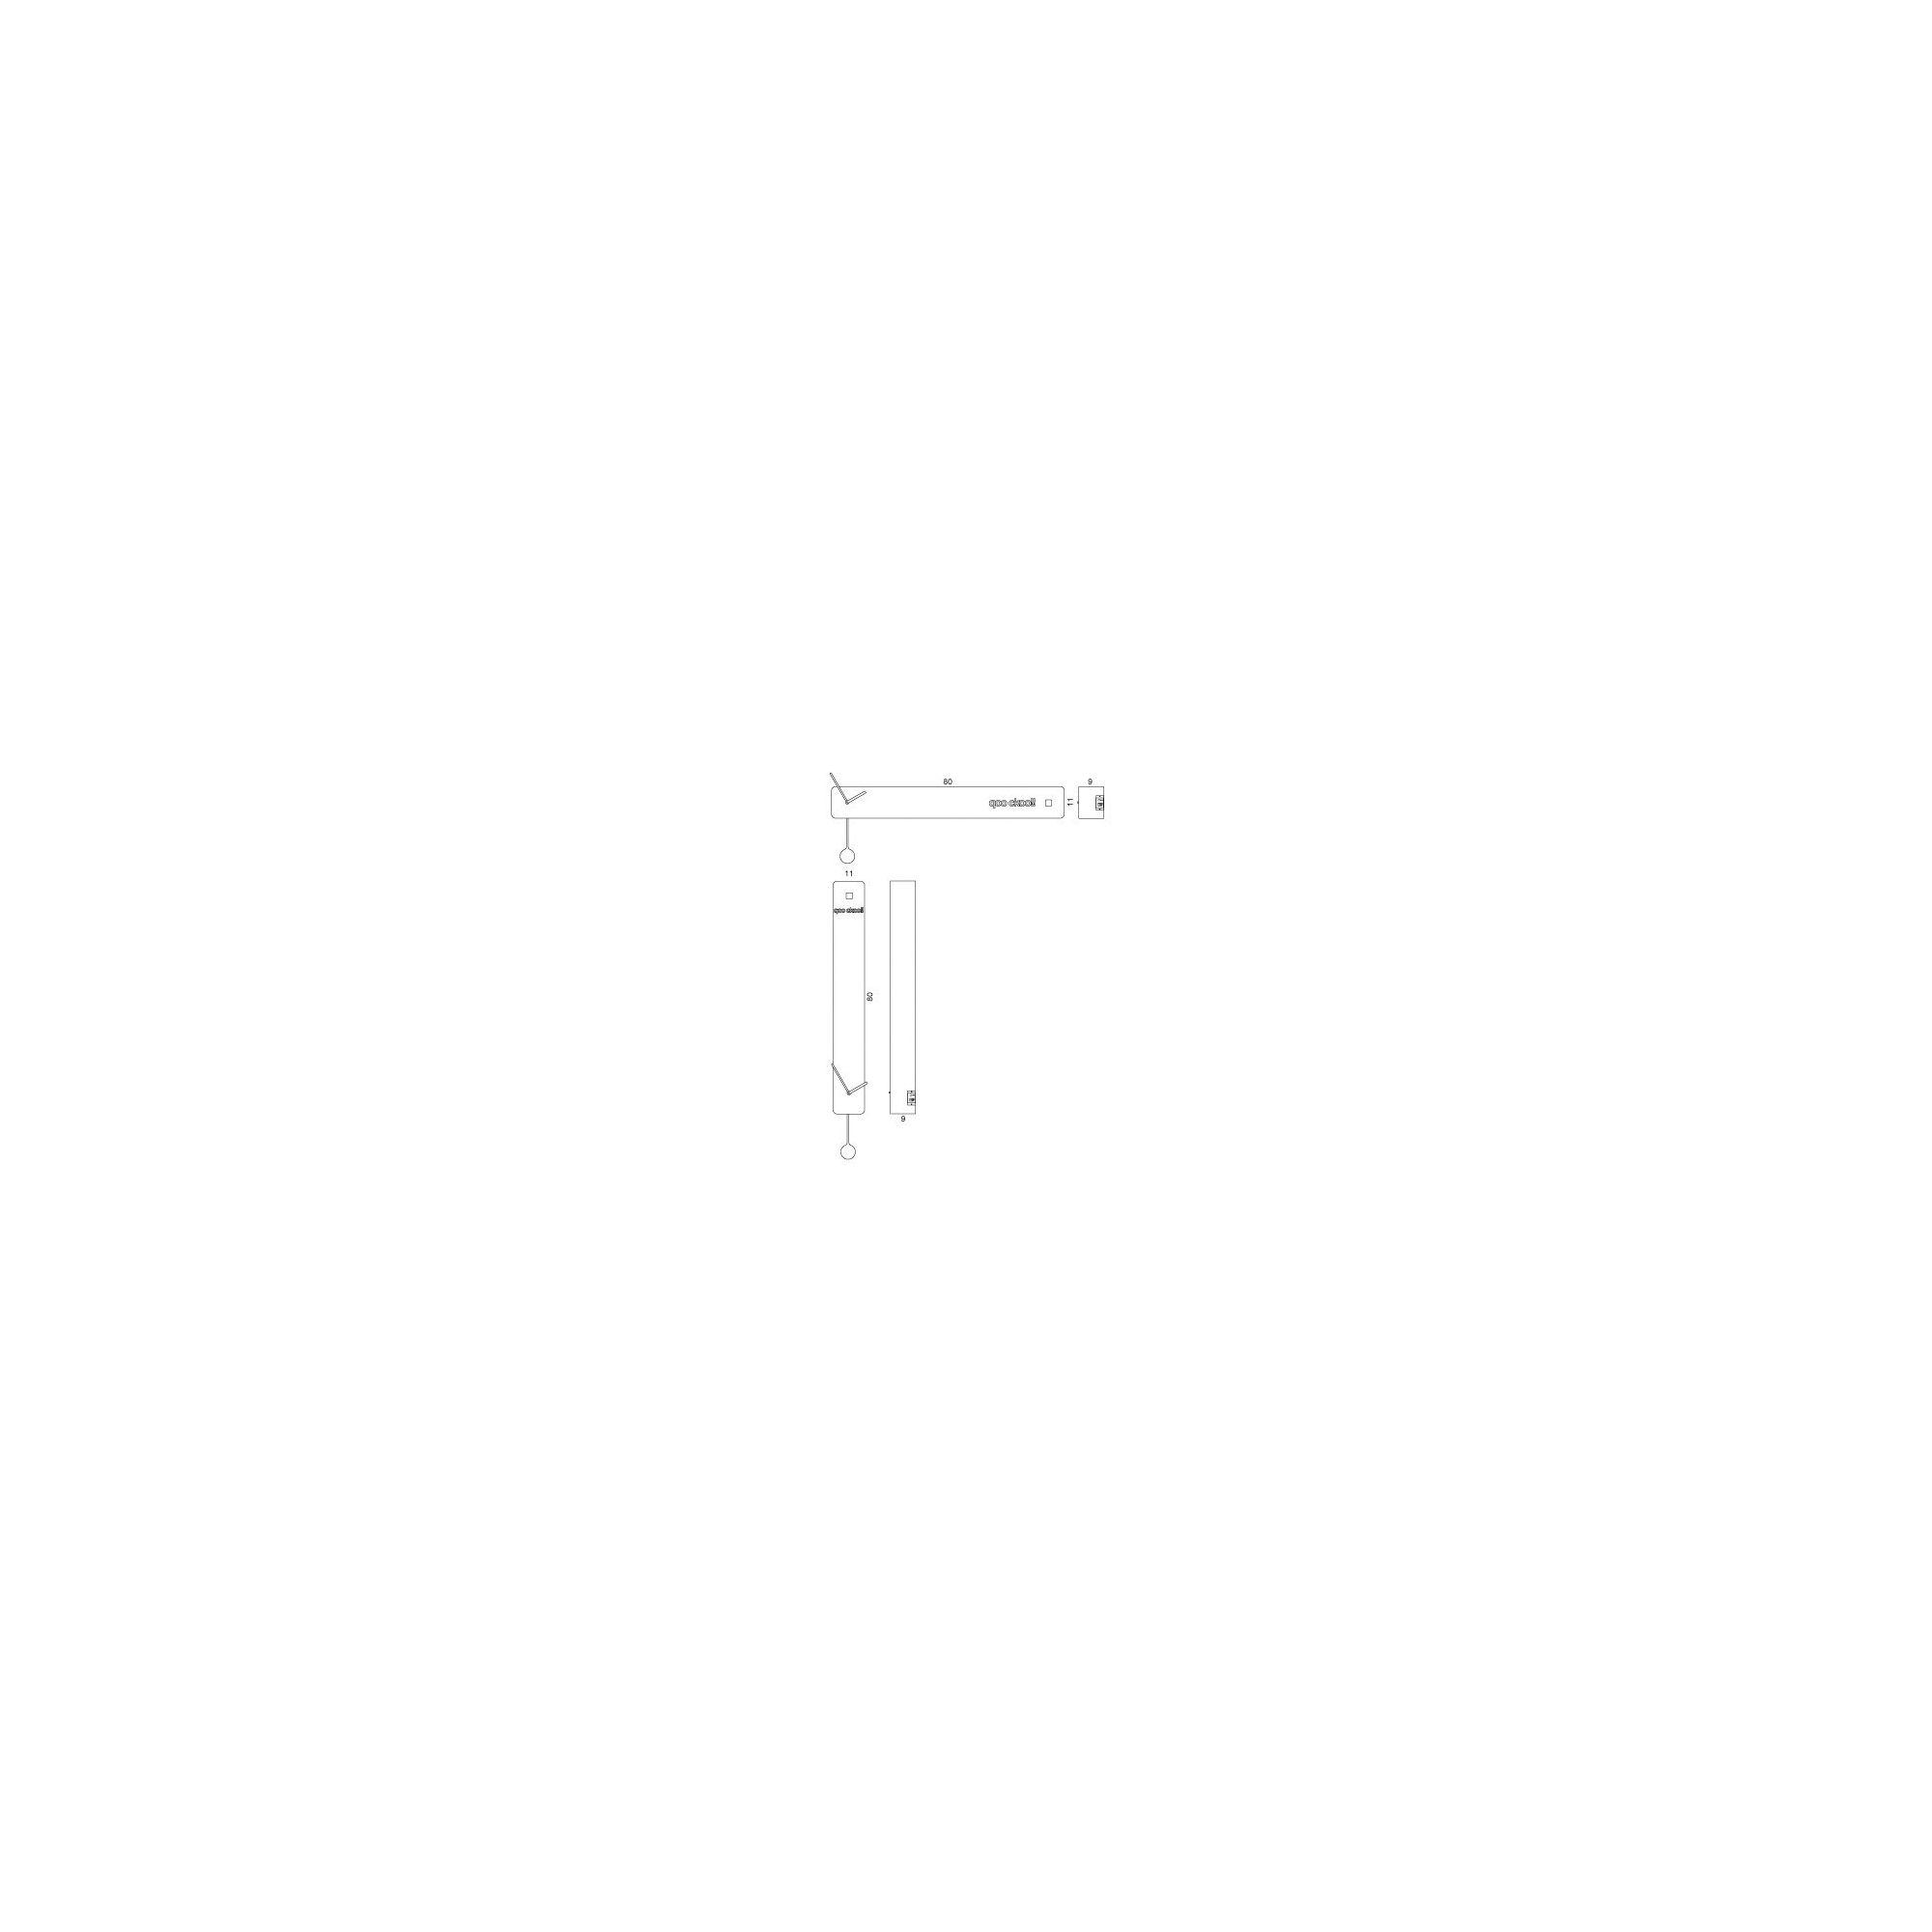 Progetti q02 Vertical Wall Clock - White at Tesco Direct